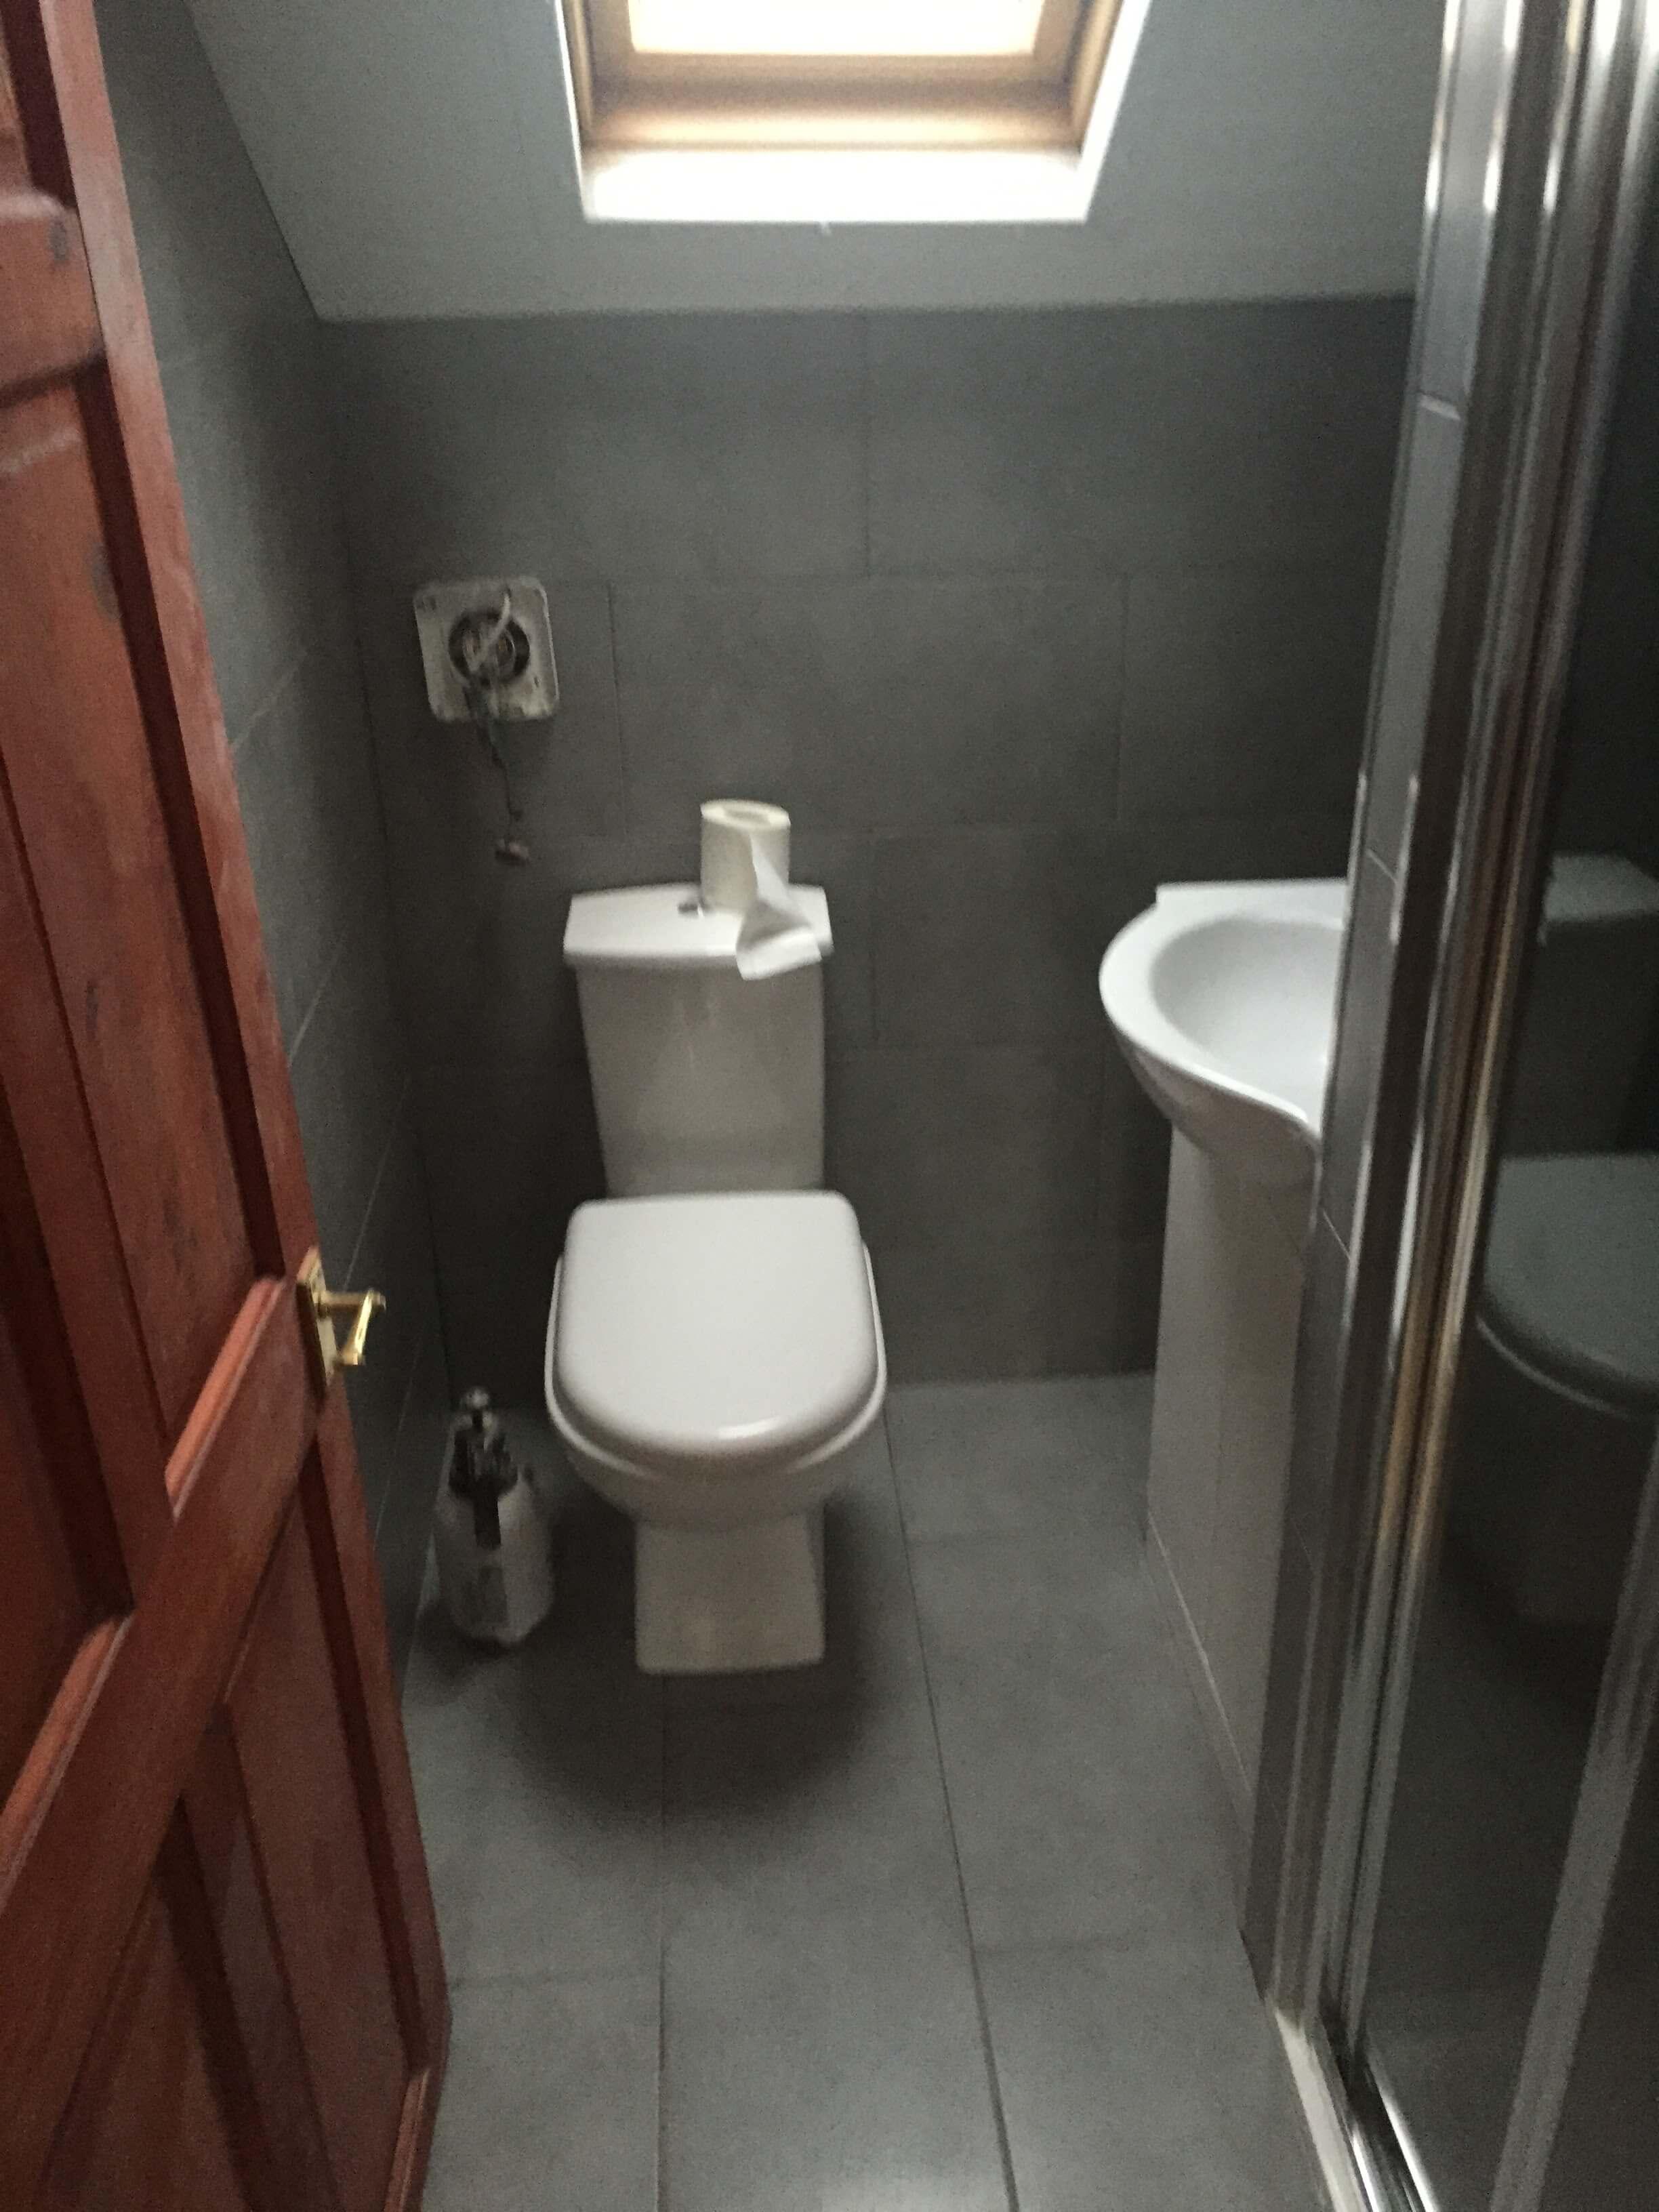 Bathroom after interior decorating